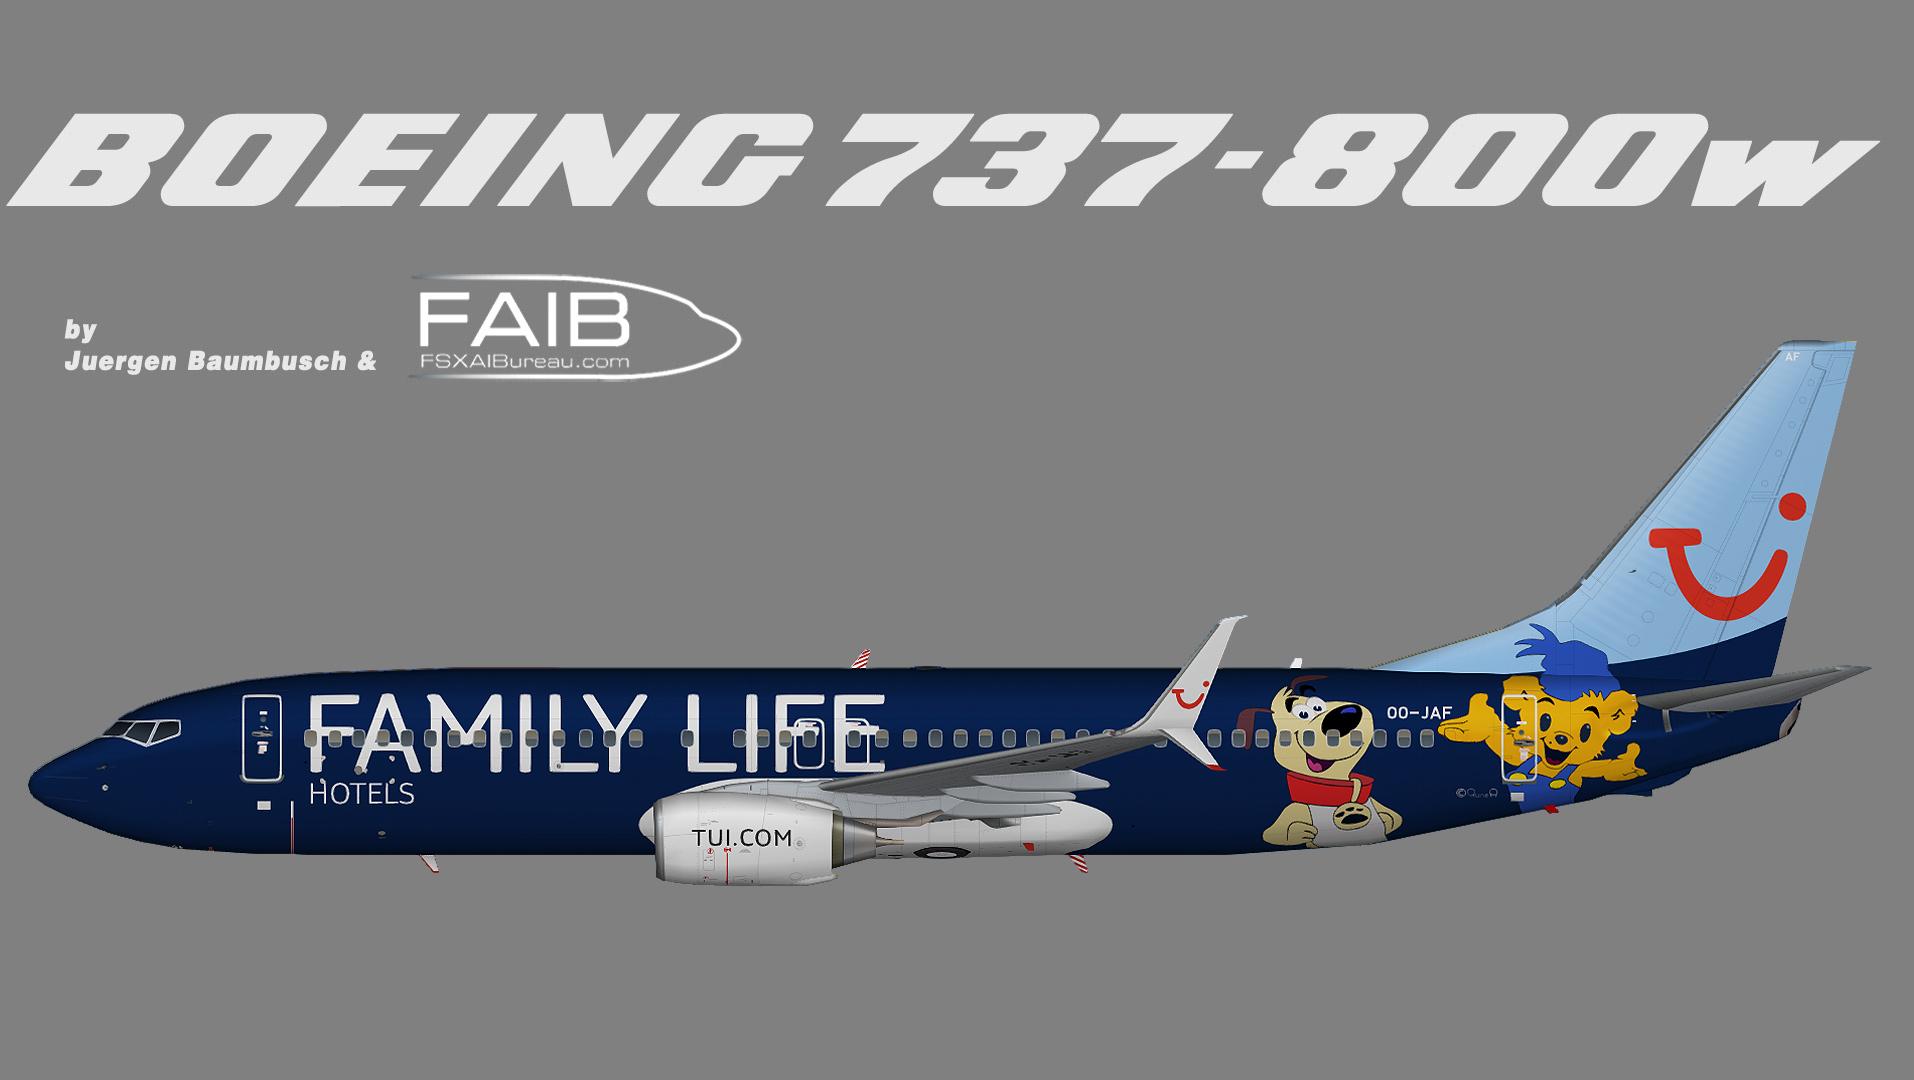 TUI Airlines Belgium Boeing 737-800 SSW Family Life Logojet